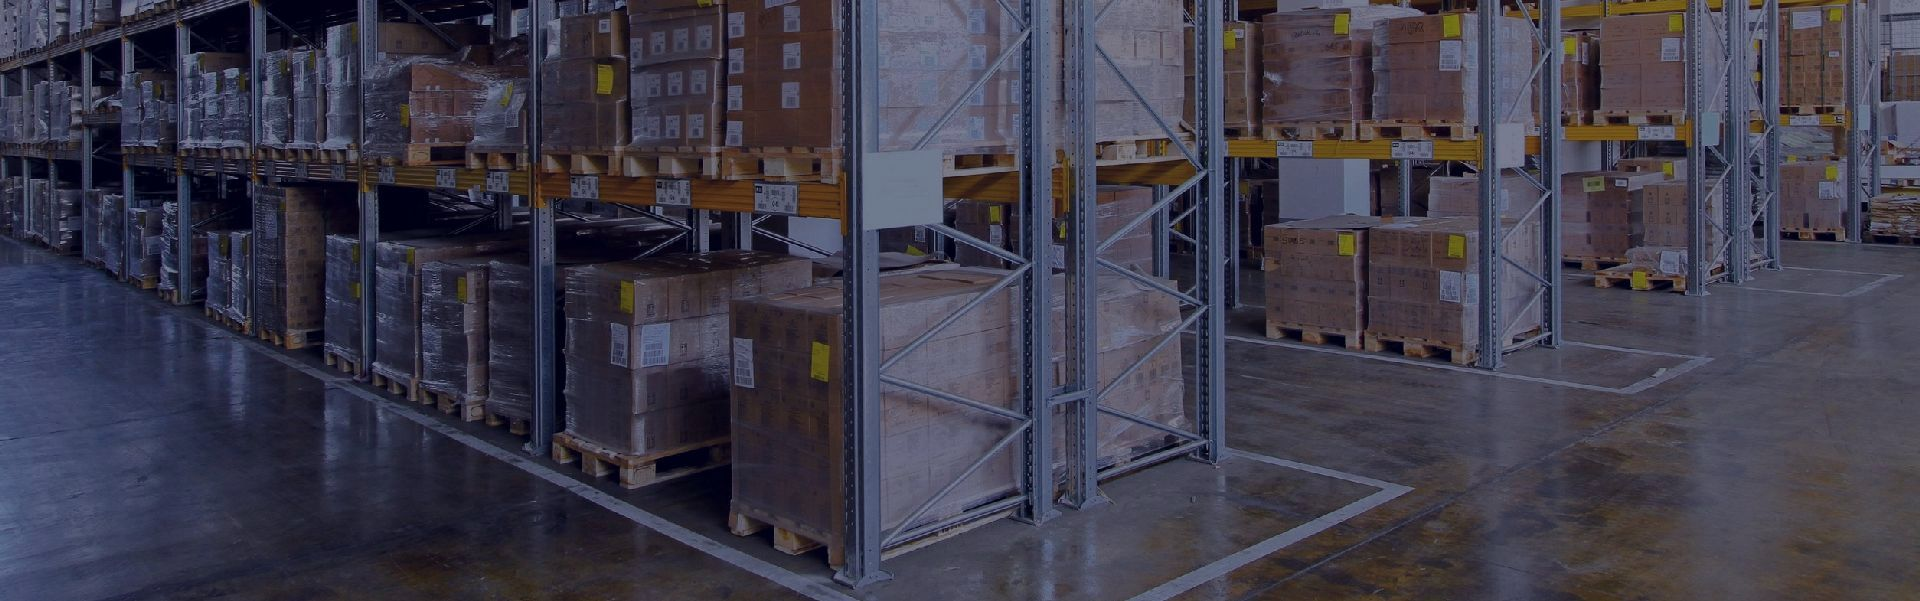 Komplexné logistické služby pod jednou strechou